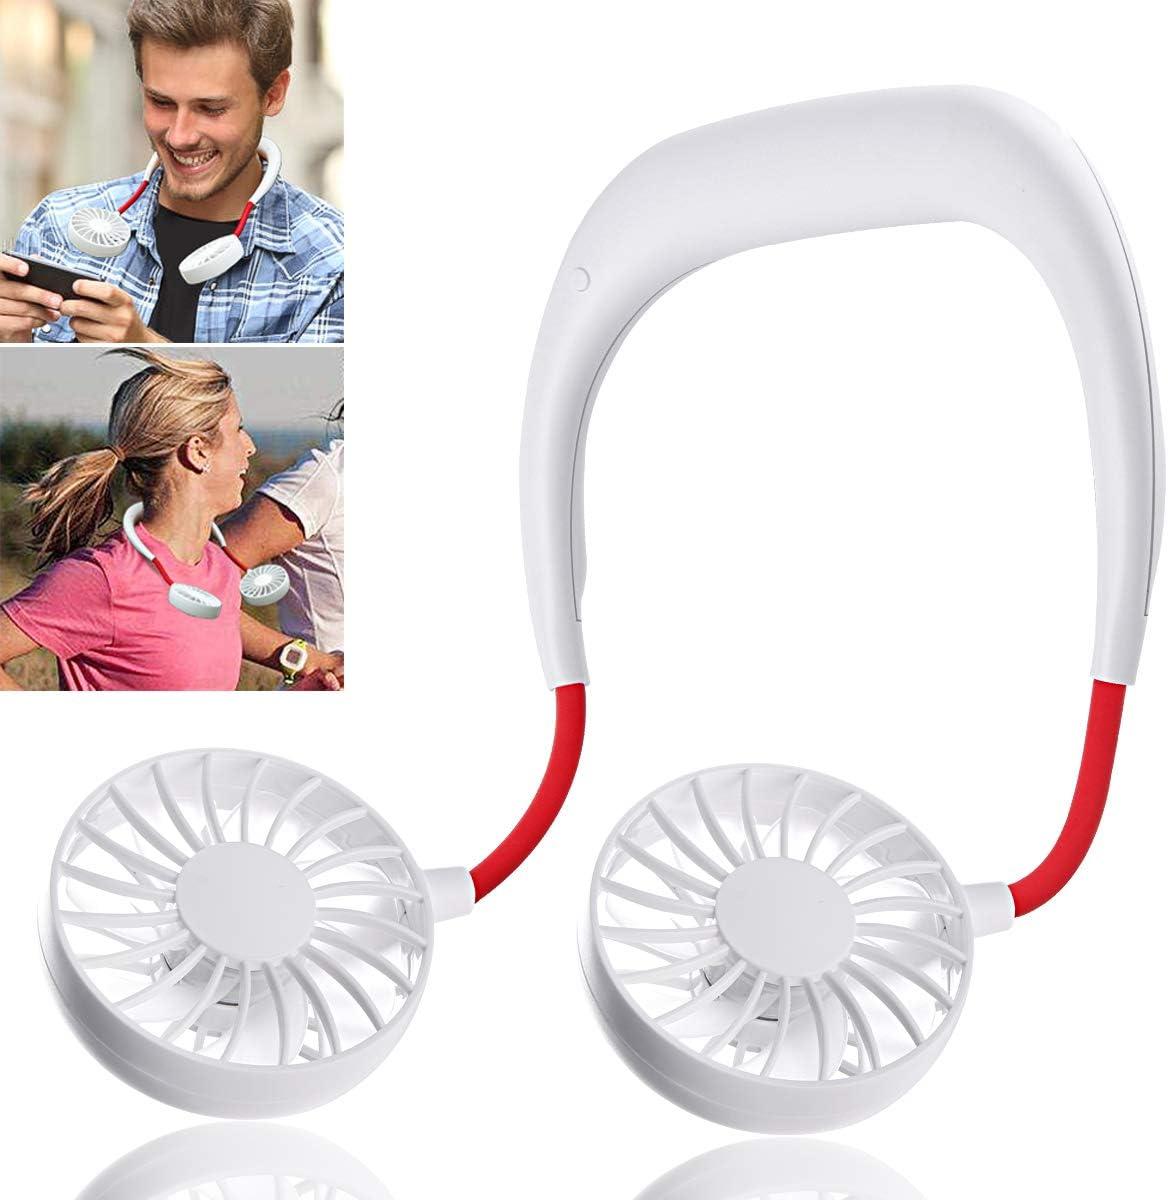 OPOLEMIN Hands Free Portable Neck Fan - Rechargeable Mini Personal USB Fan, Headphone Design Wearable Neckband Fan, USB Neck Fan for Home Office Travel Indoor Outdoor Activities (White)